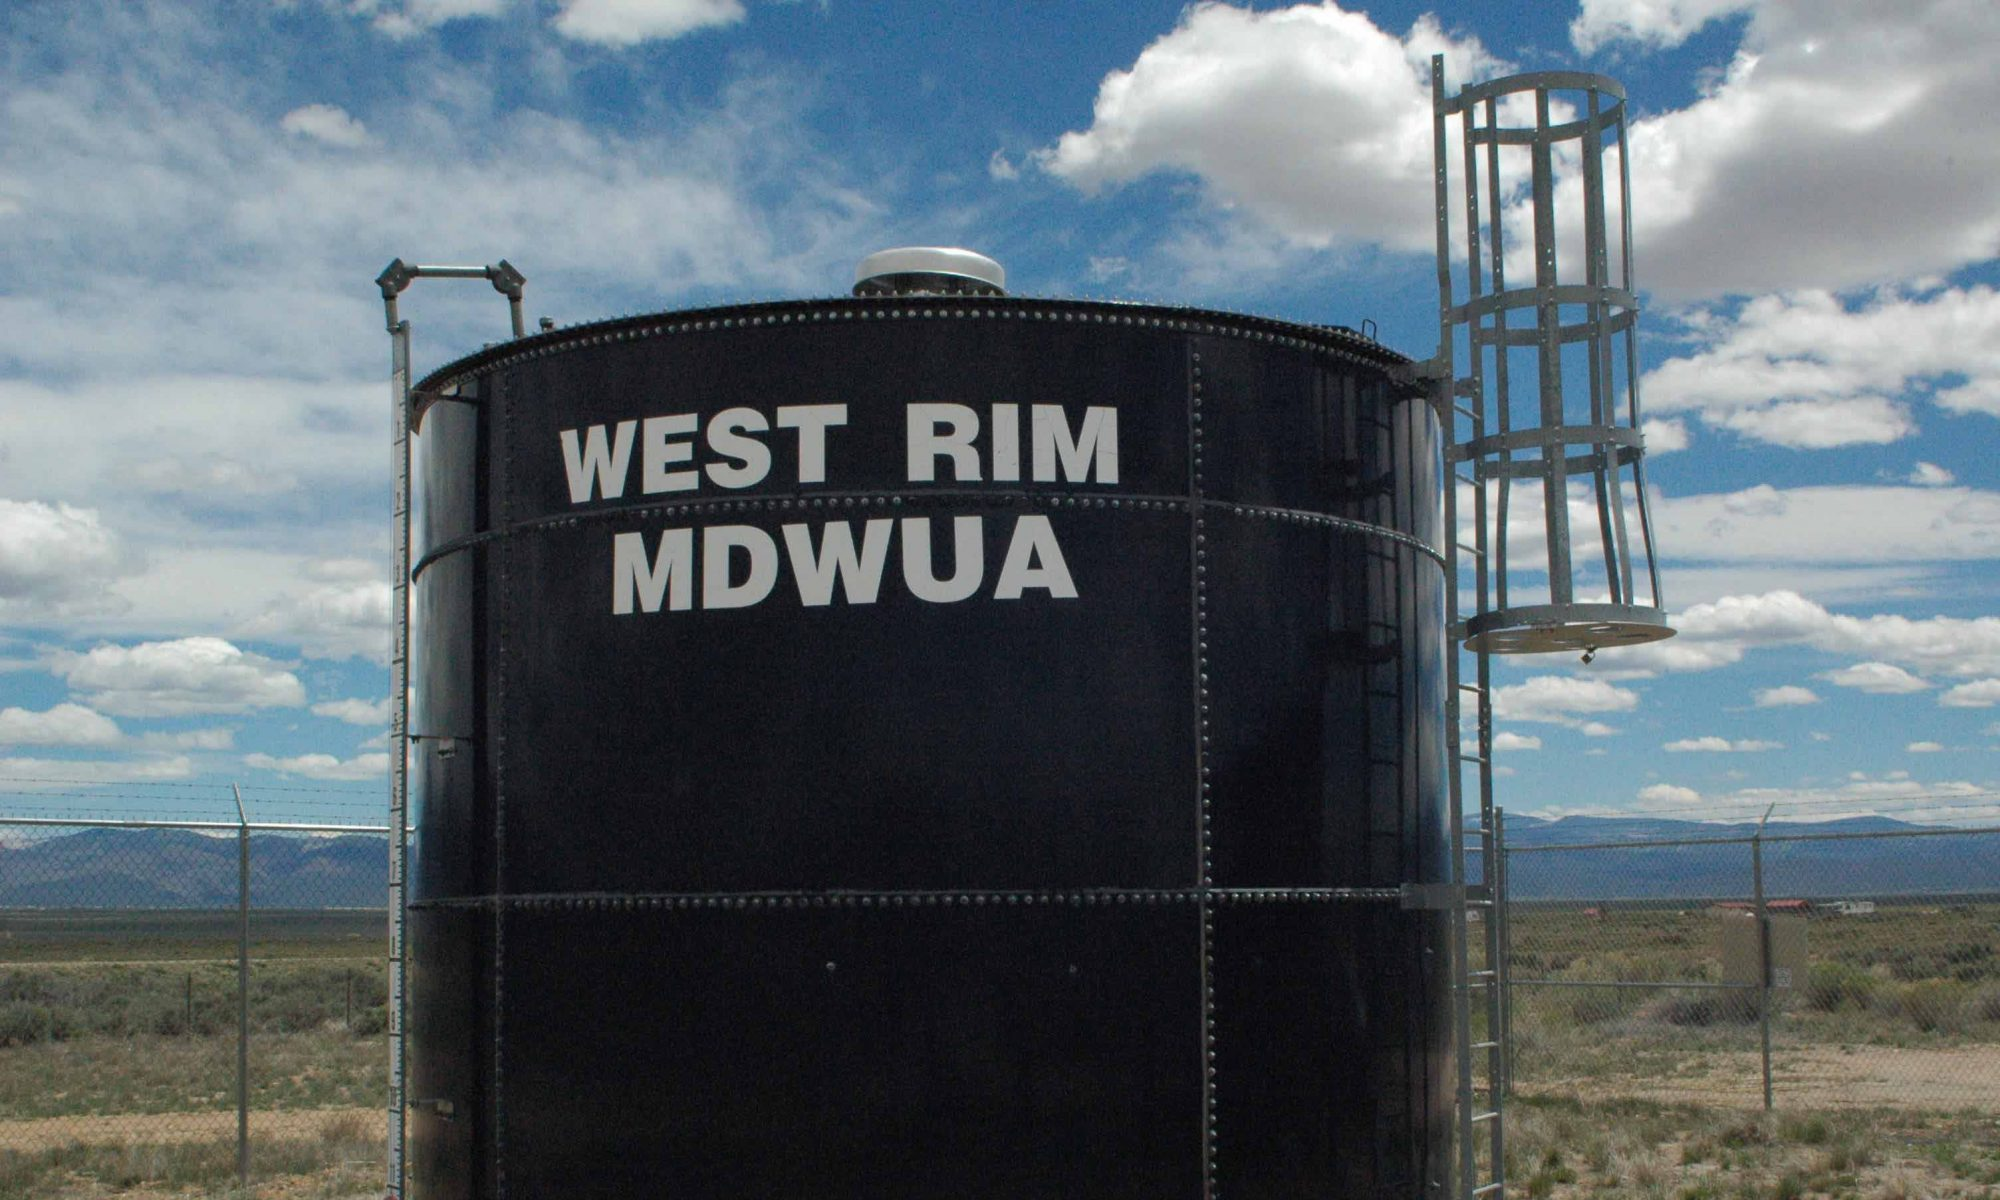 West Rim MDWUA